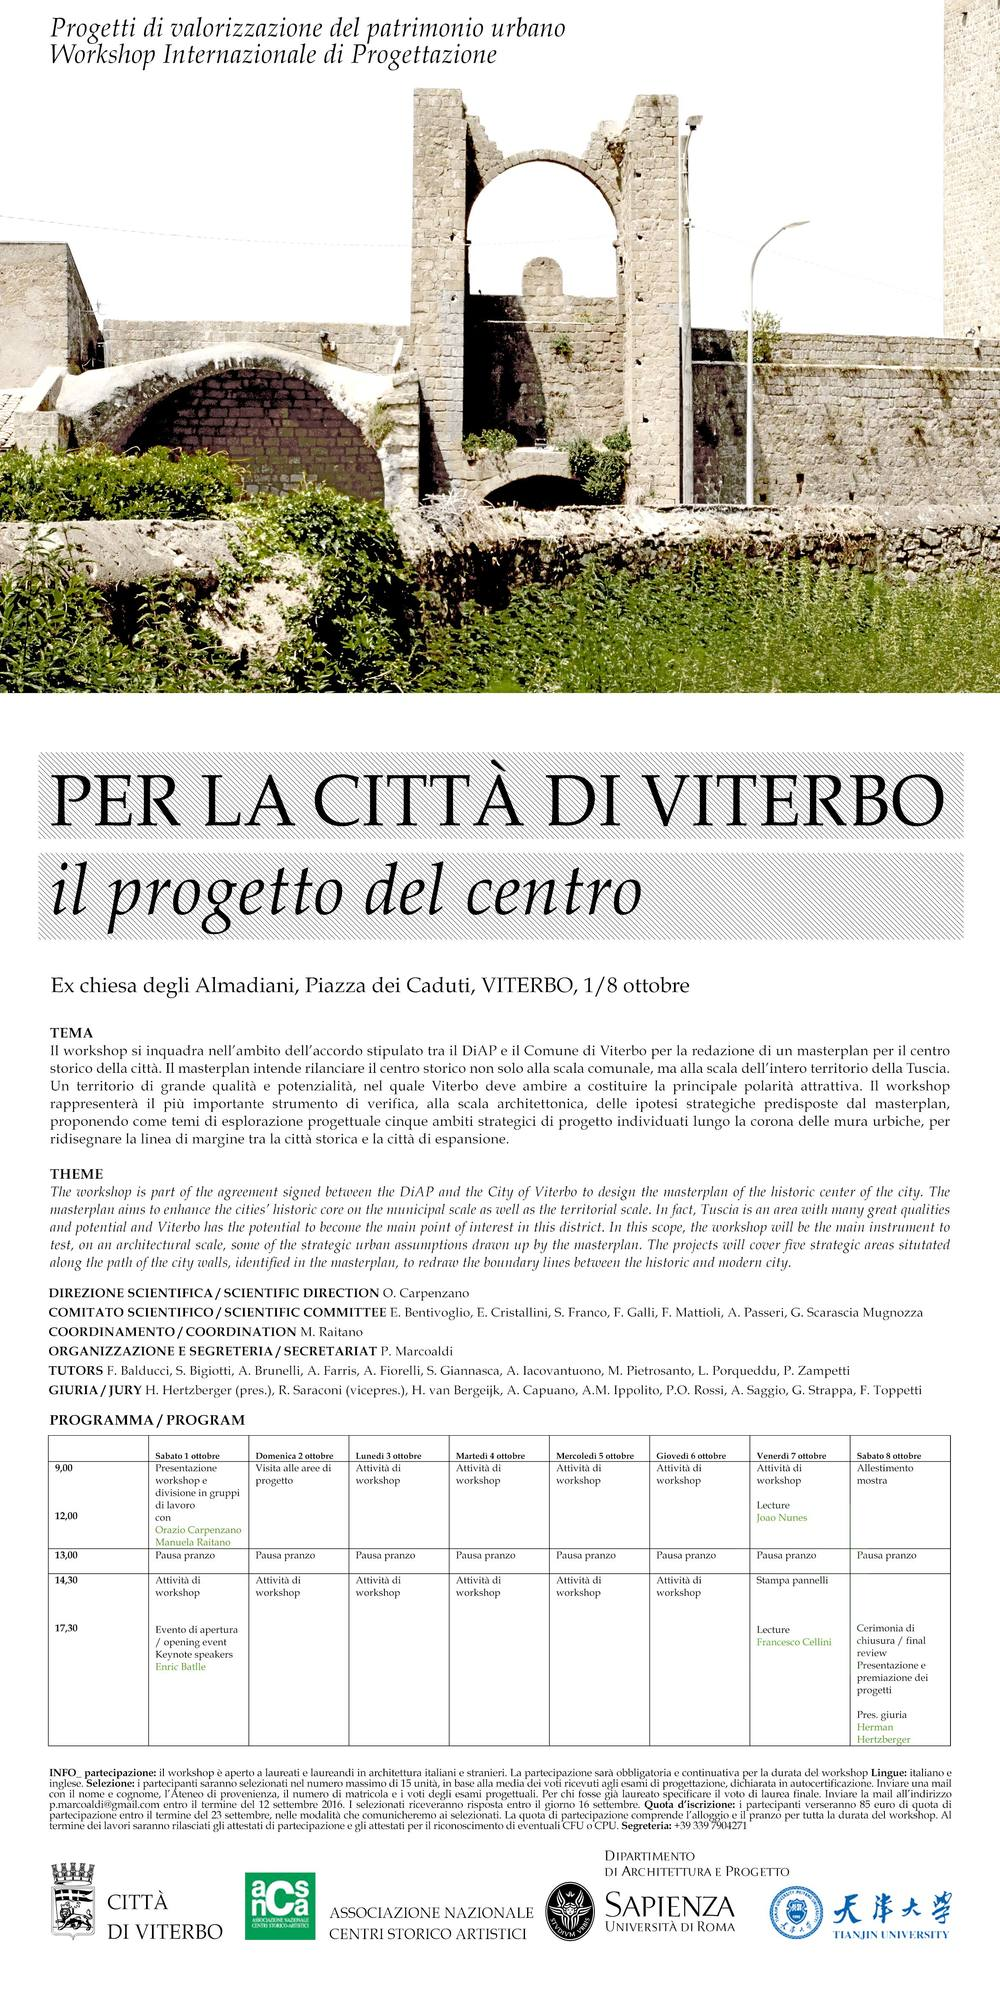 workshop viterbo iacovantuono locandina